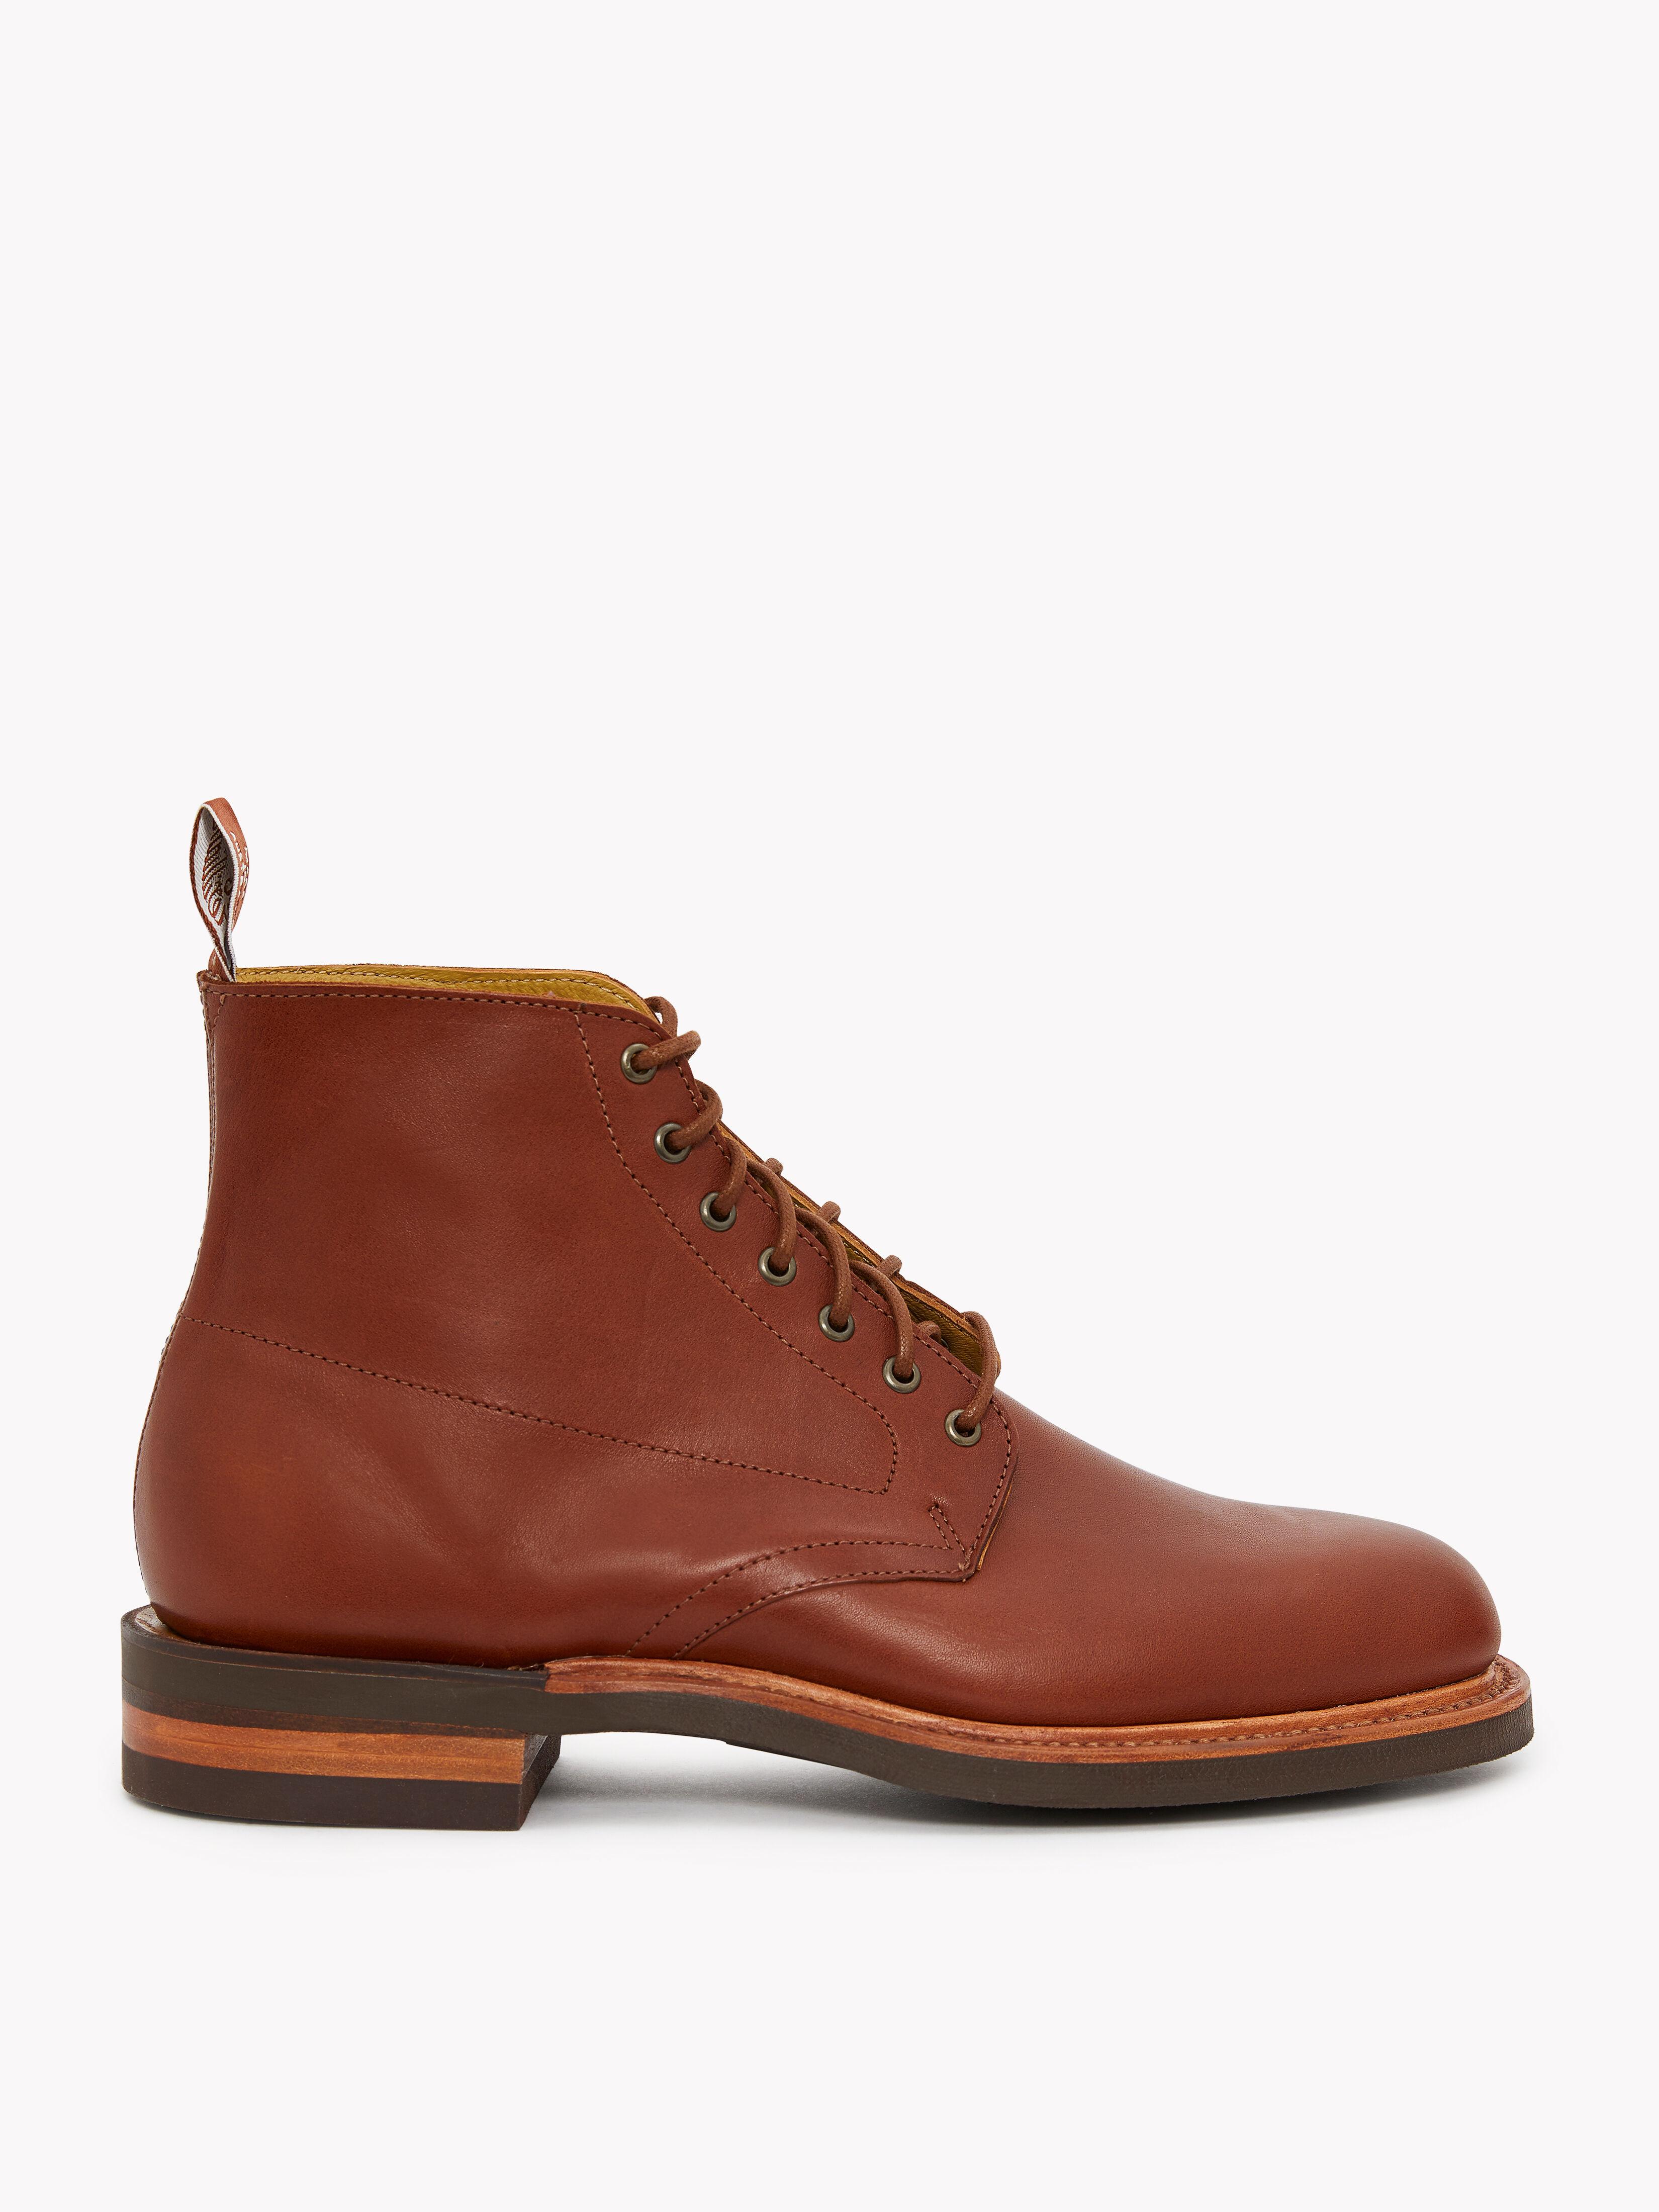 Men's Boots for sale   eBay